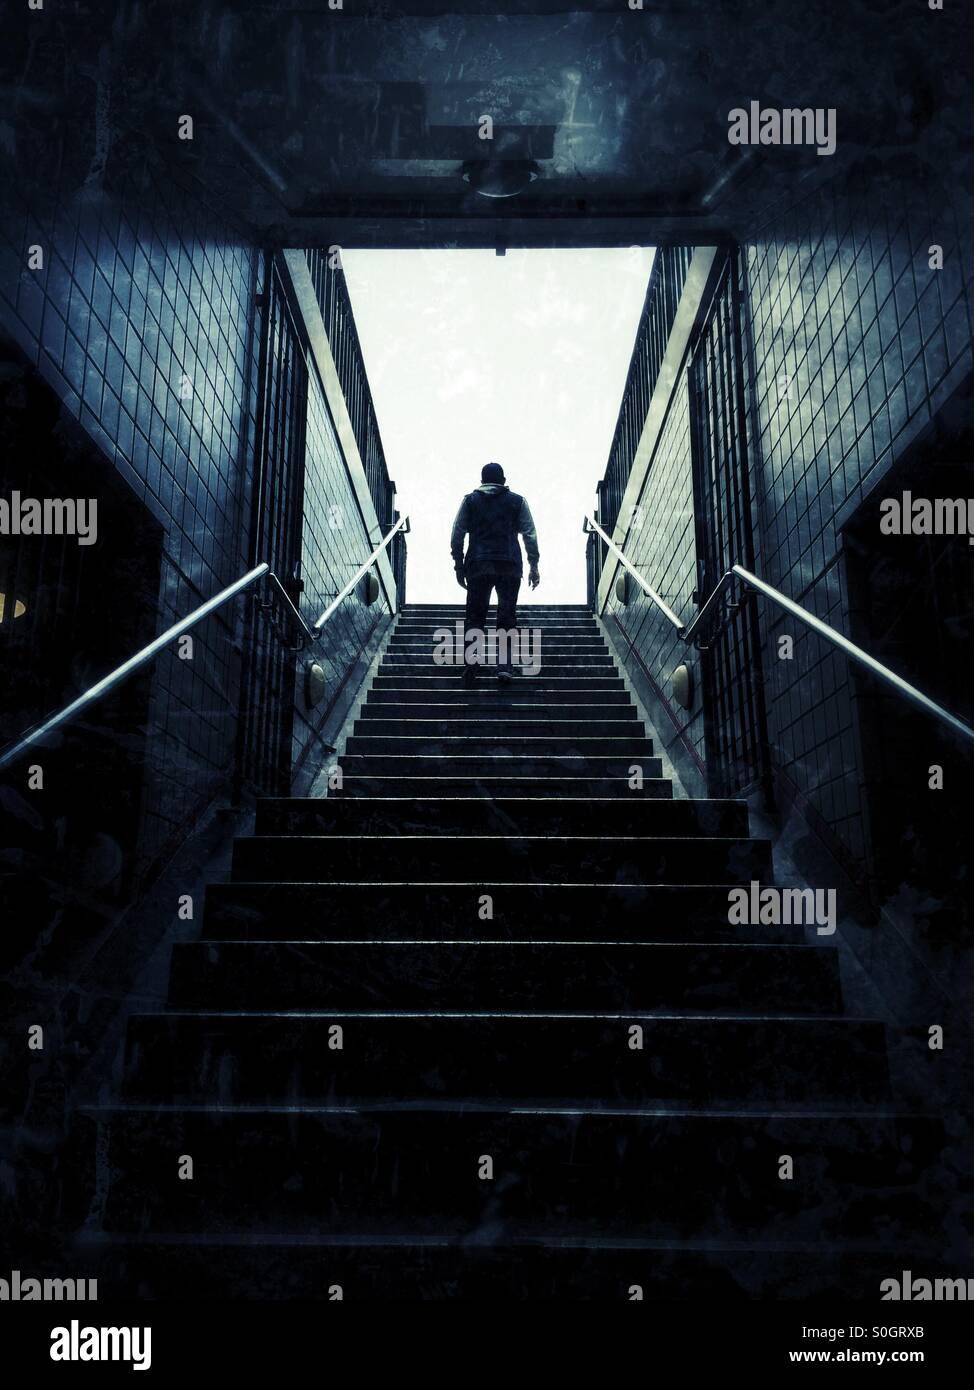 Mann geht die Treppe hinauf Stockbild